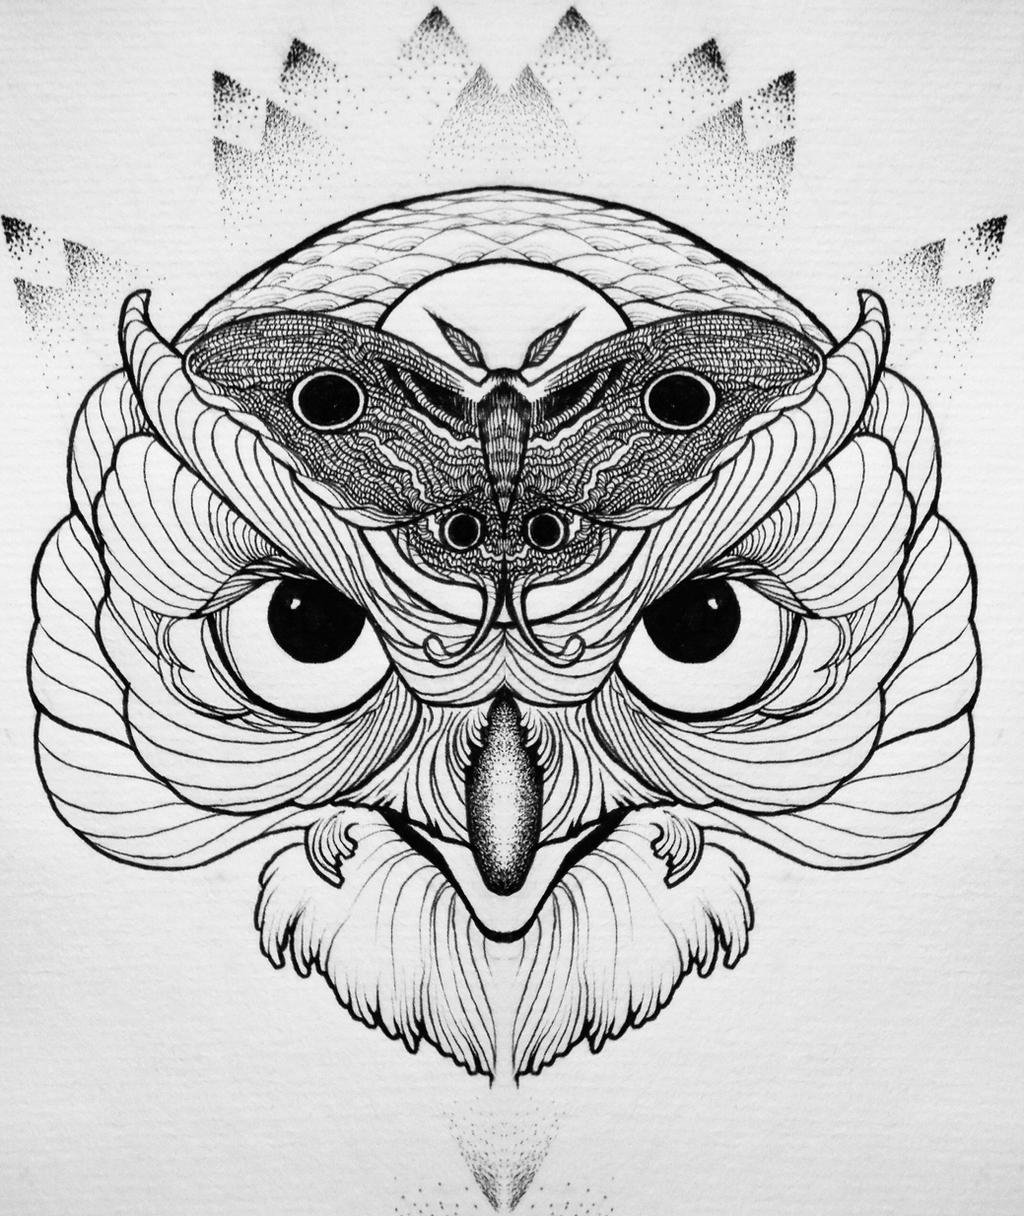 Owl tattoo sketch by lookawake on deviantart for Cool tattoo drawings